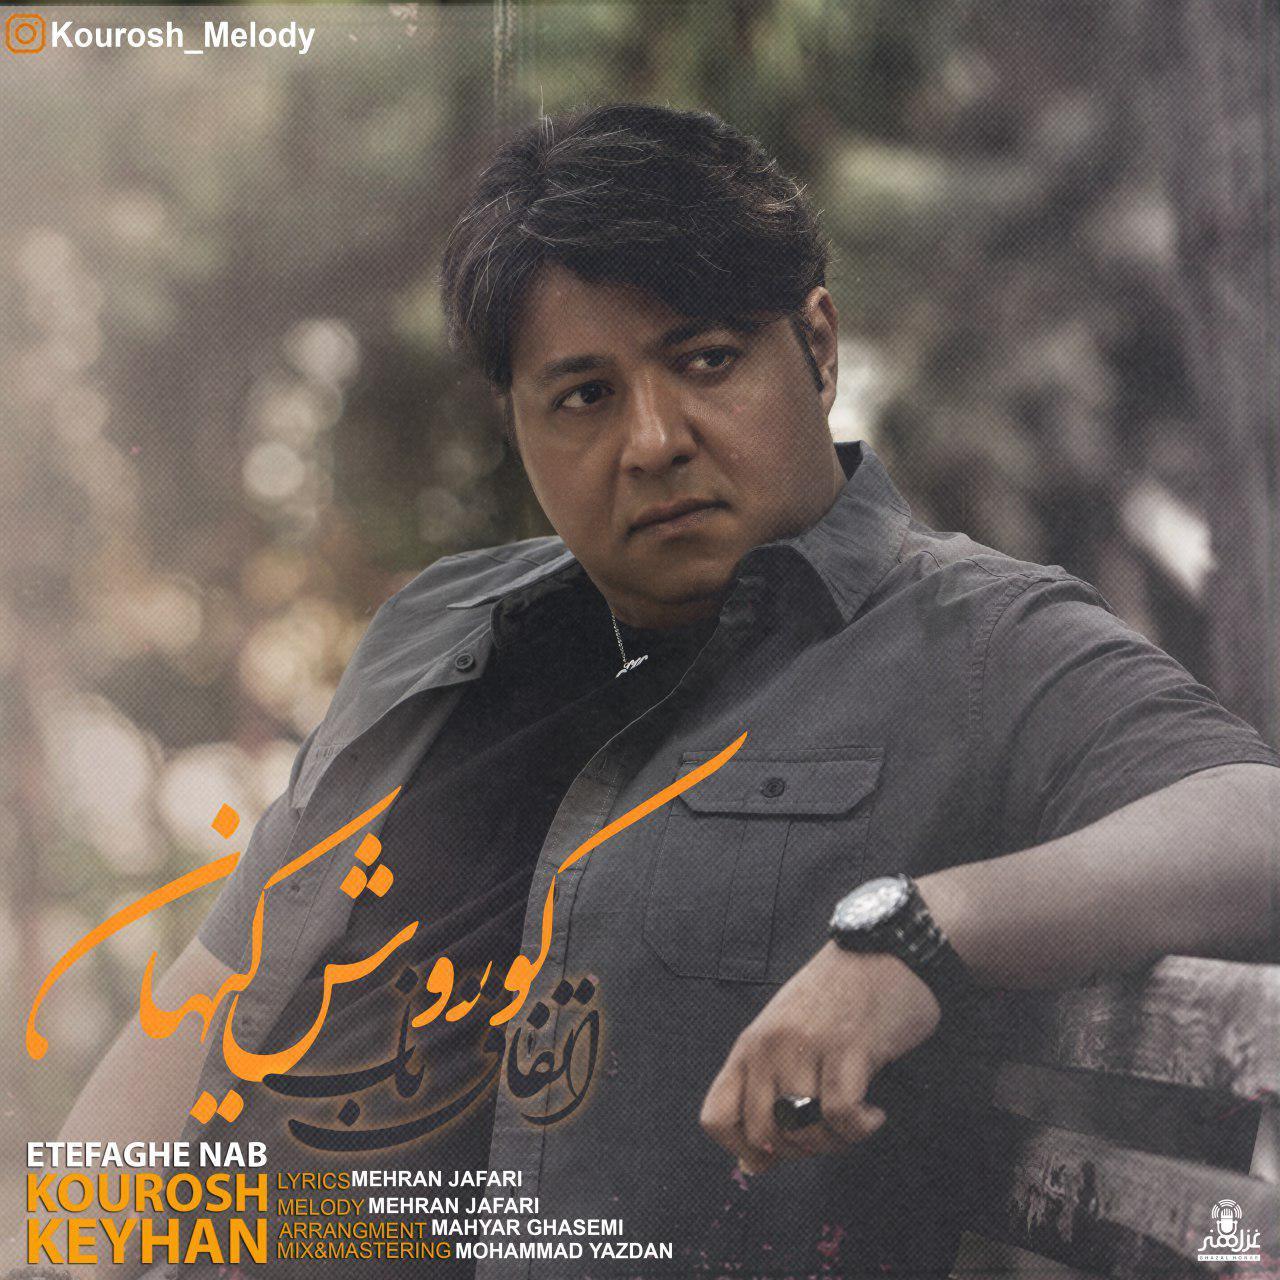 Kourosh Keyhan – Etefaghe Nab